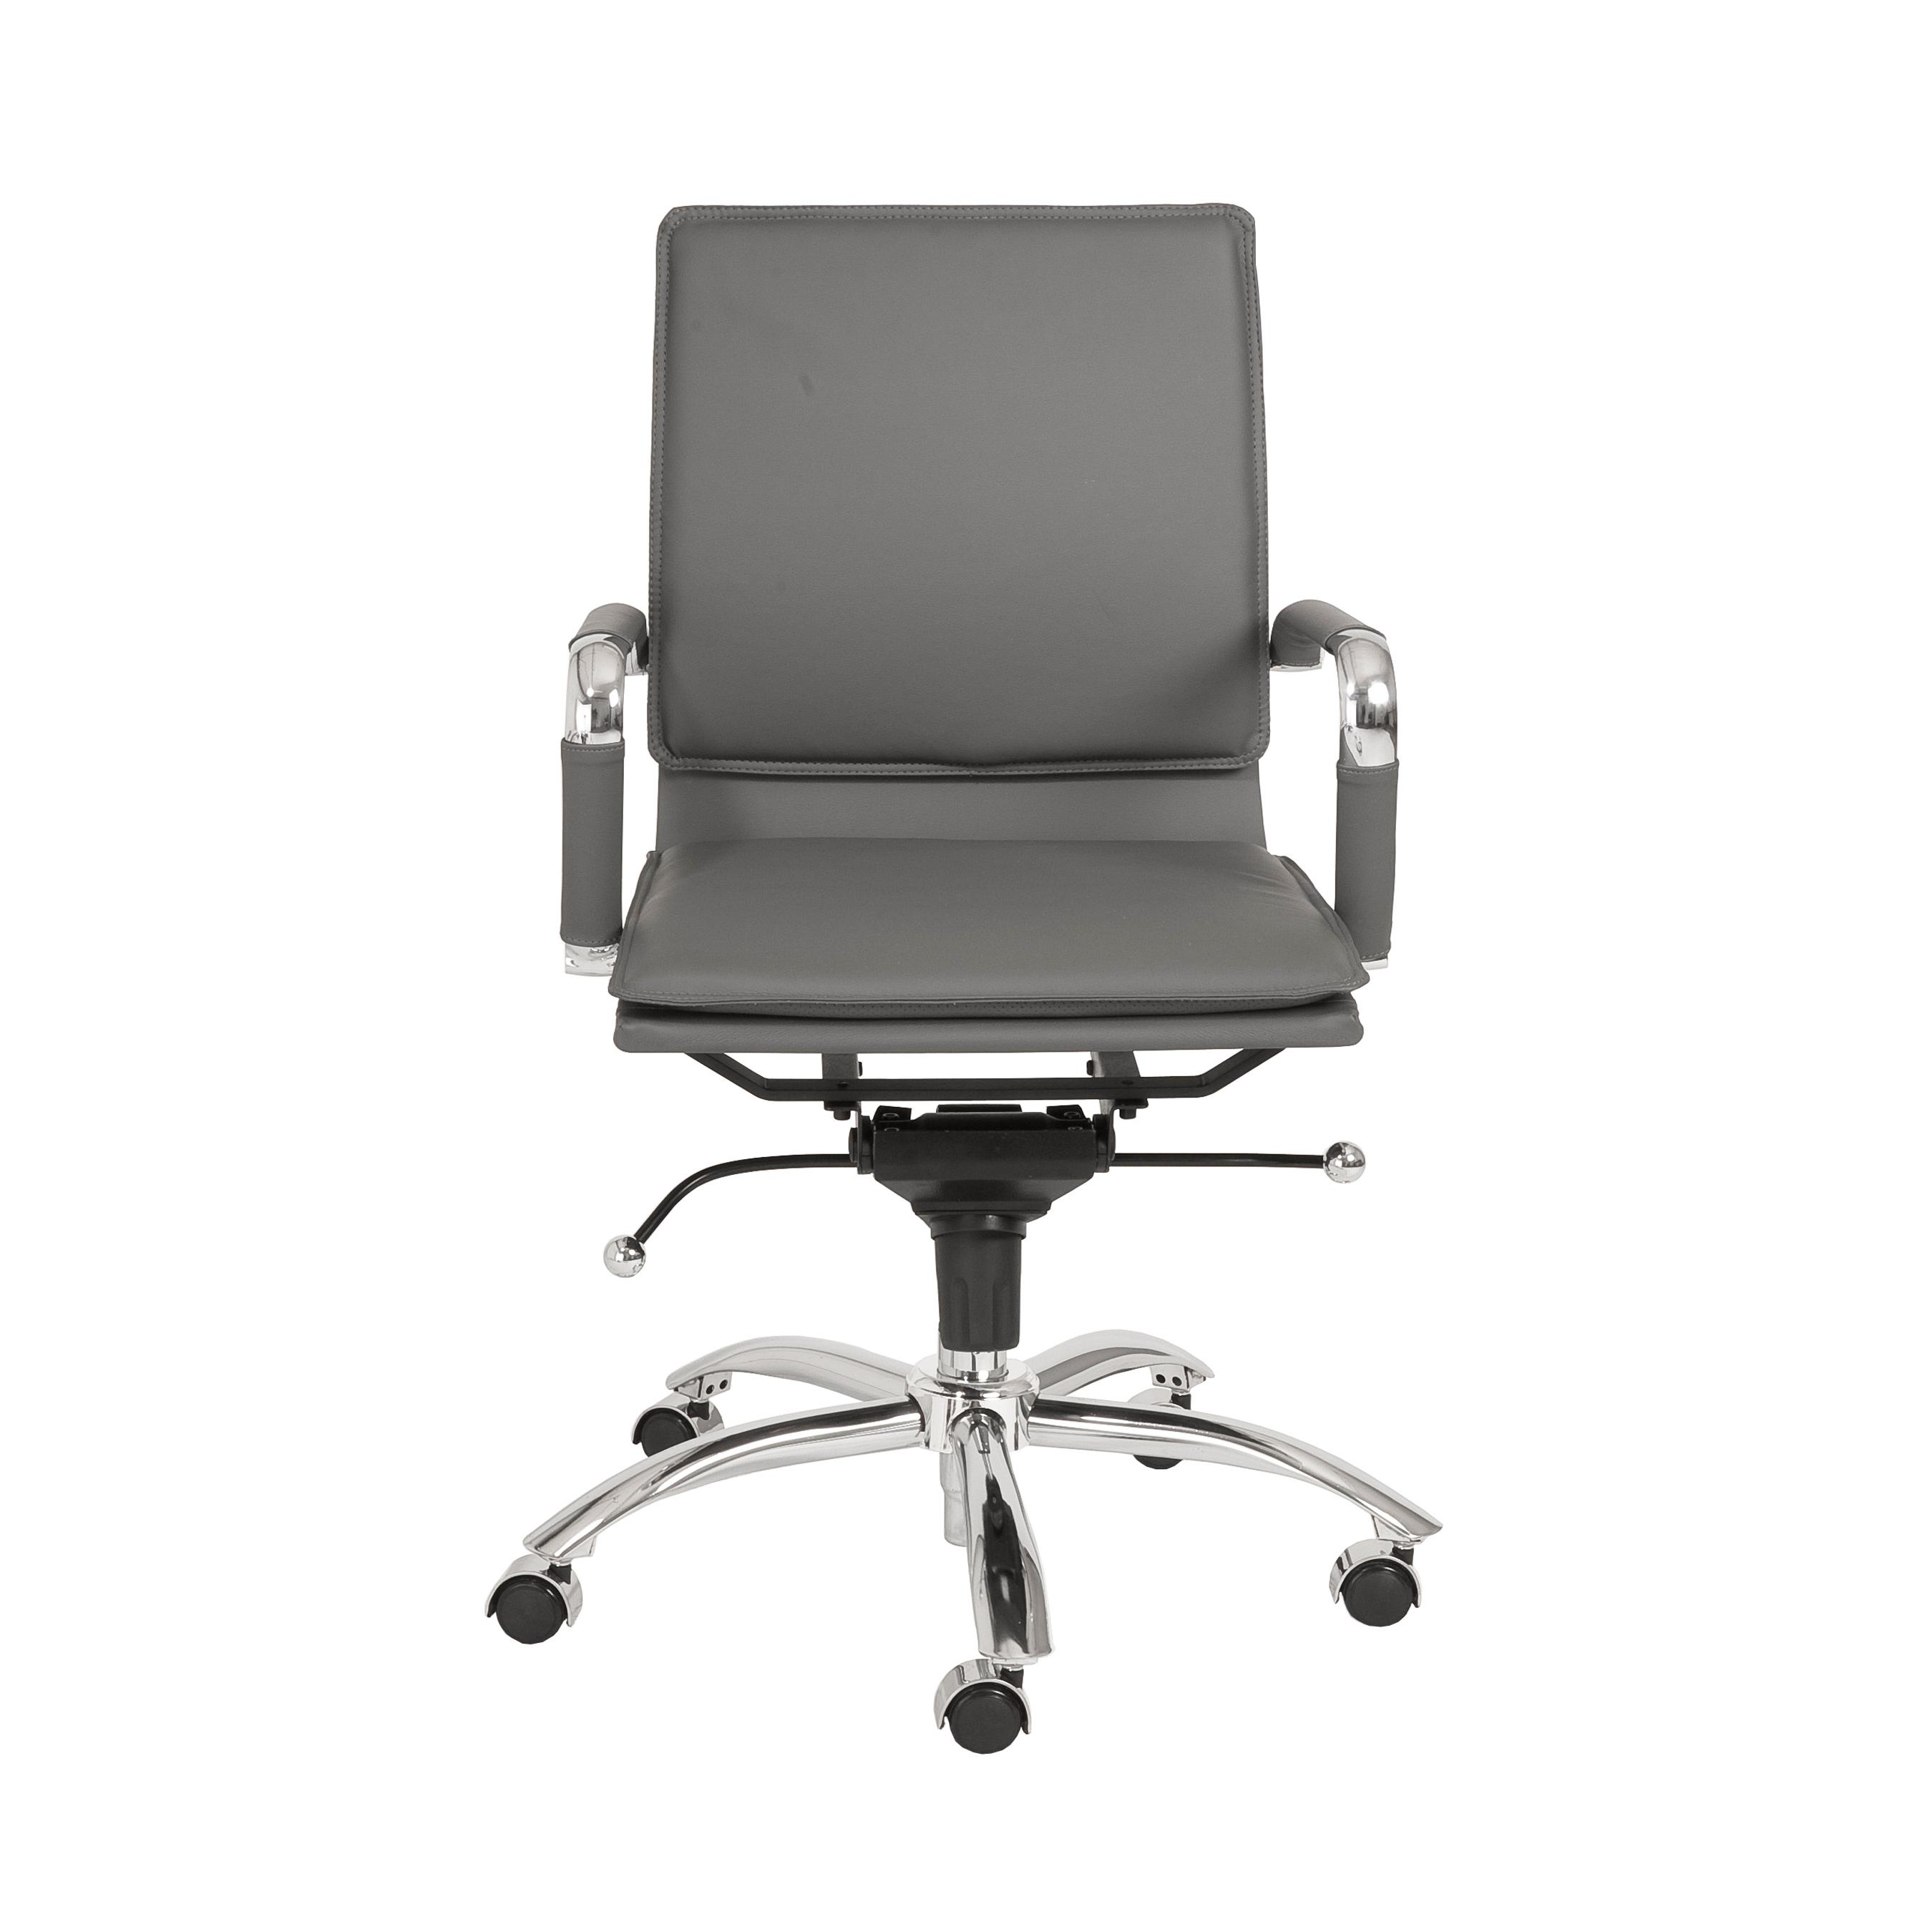 Bordeaux Velvet Accent Chair Industrial Style Home Office Design Ideas